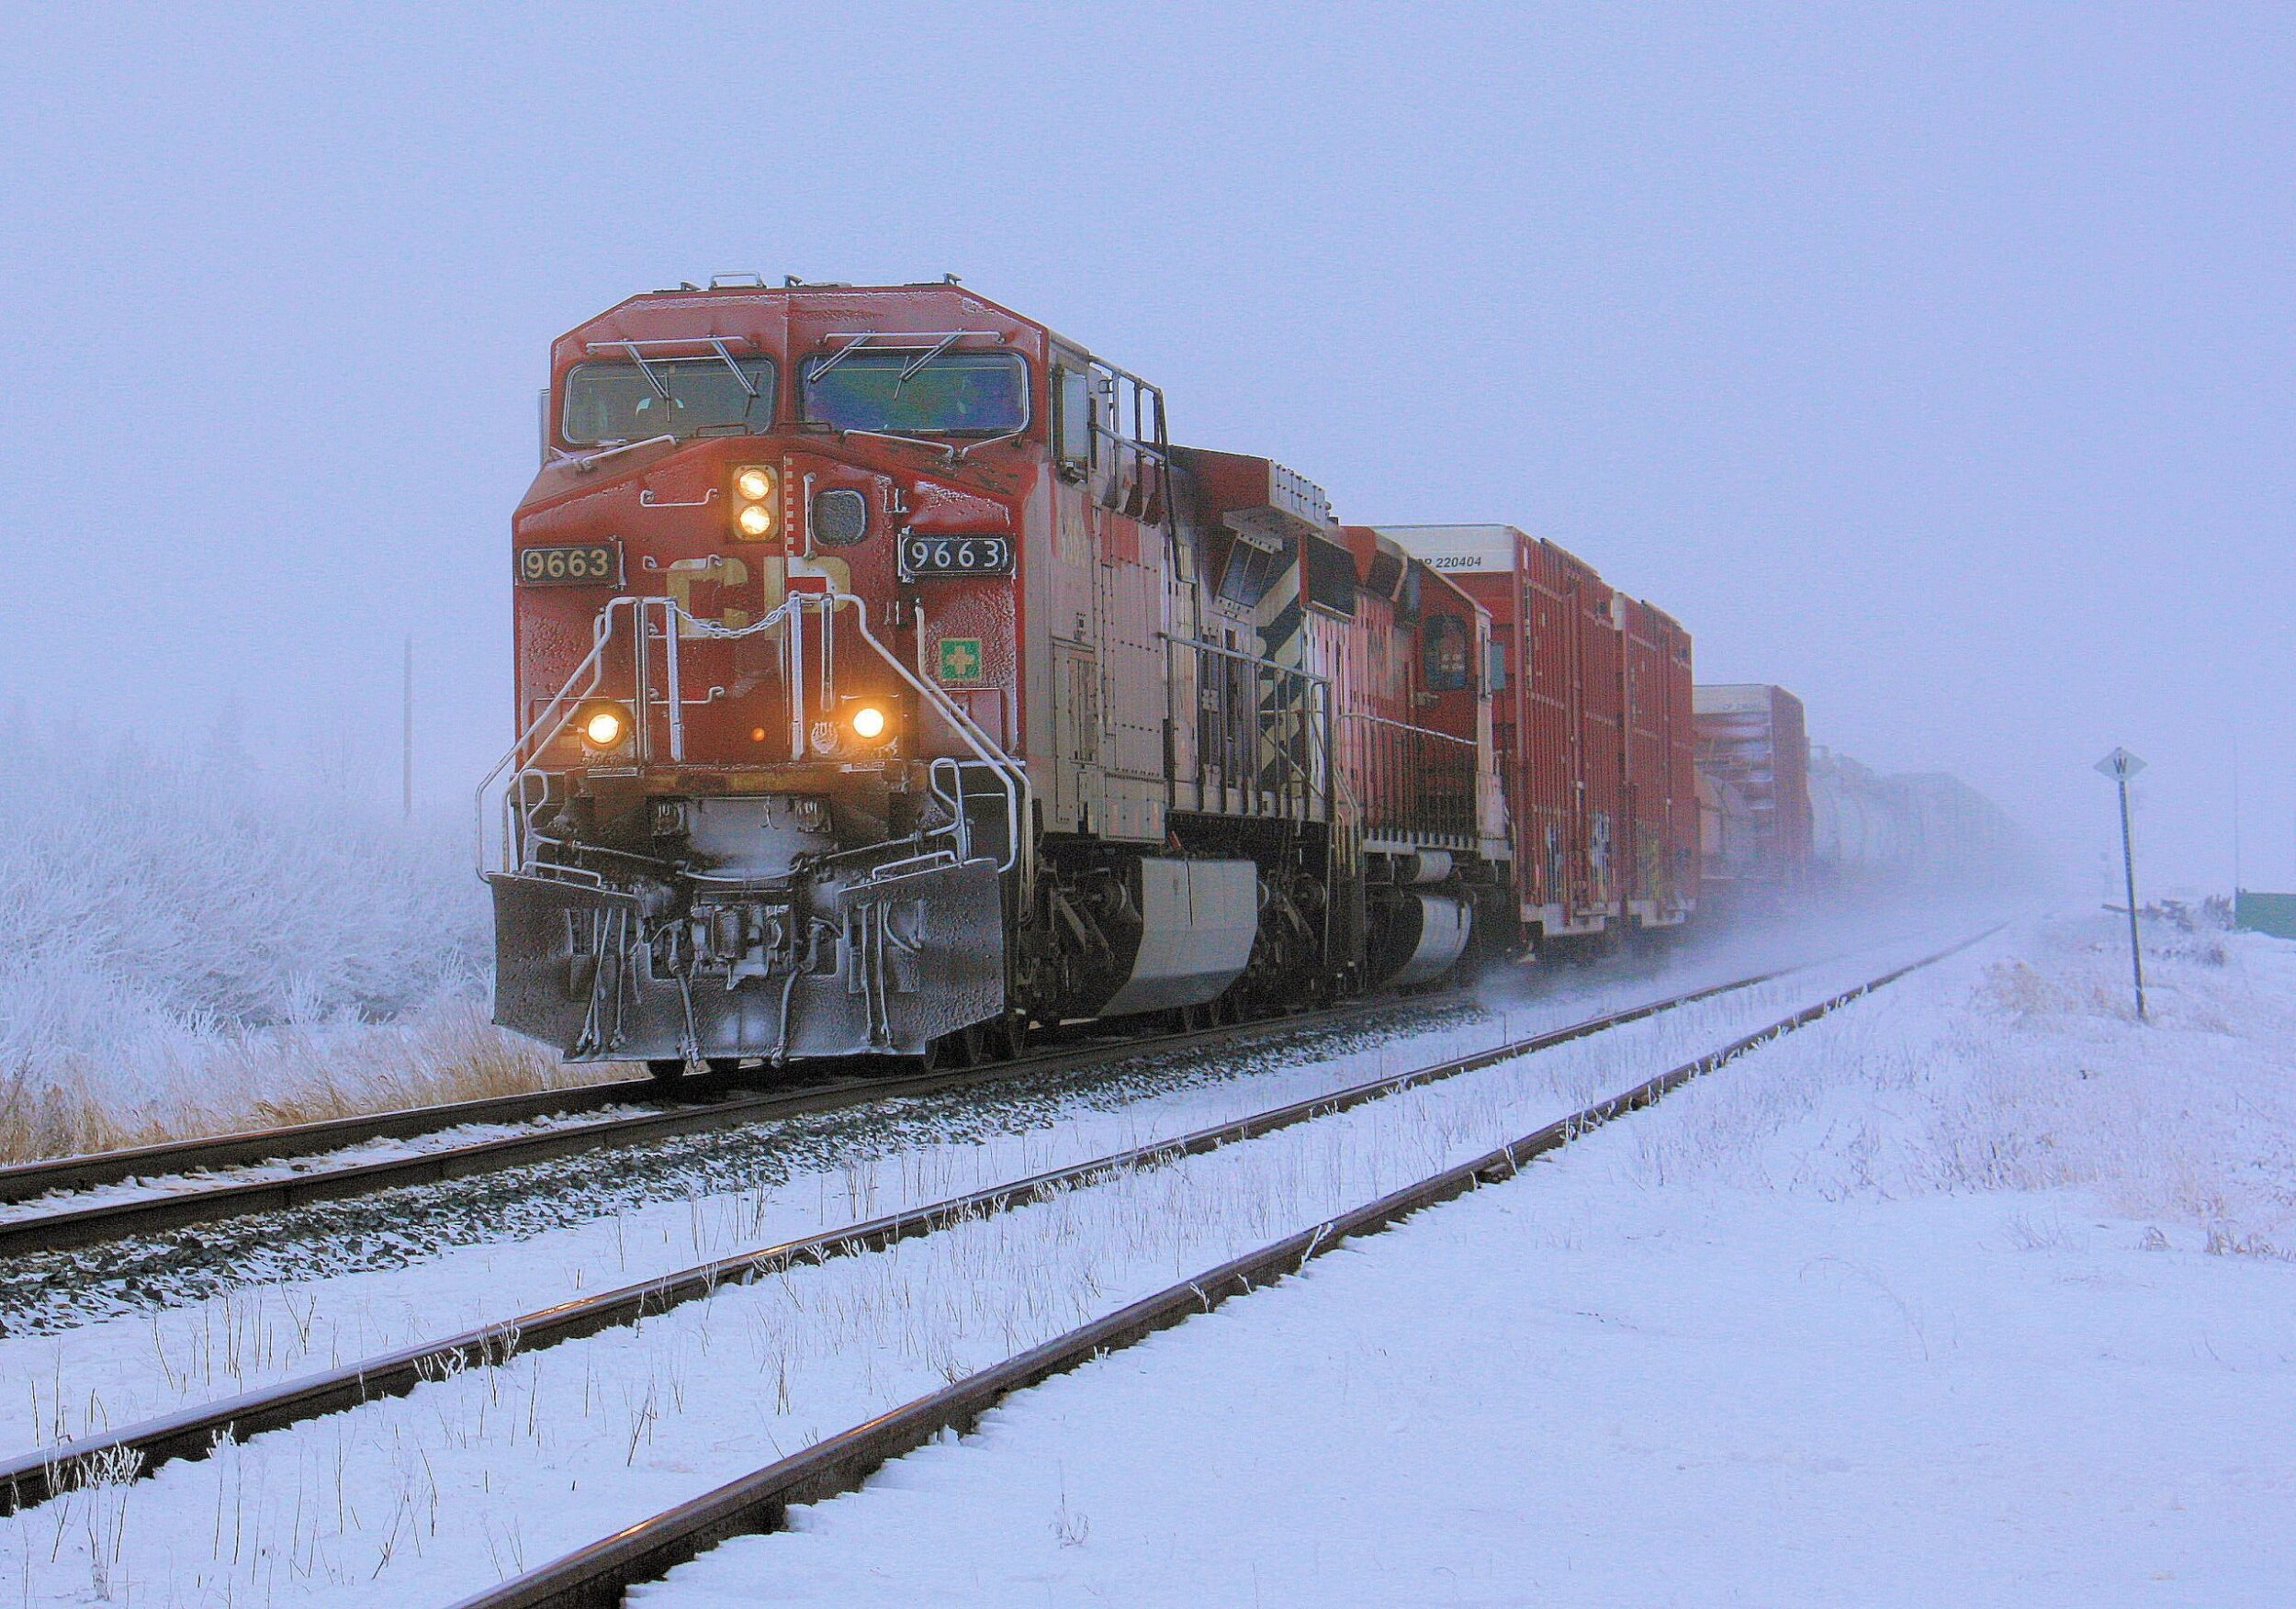 Canada train in winter, dan loran on unsplash